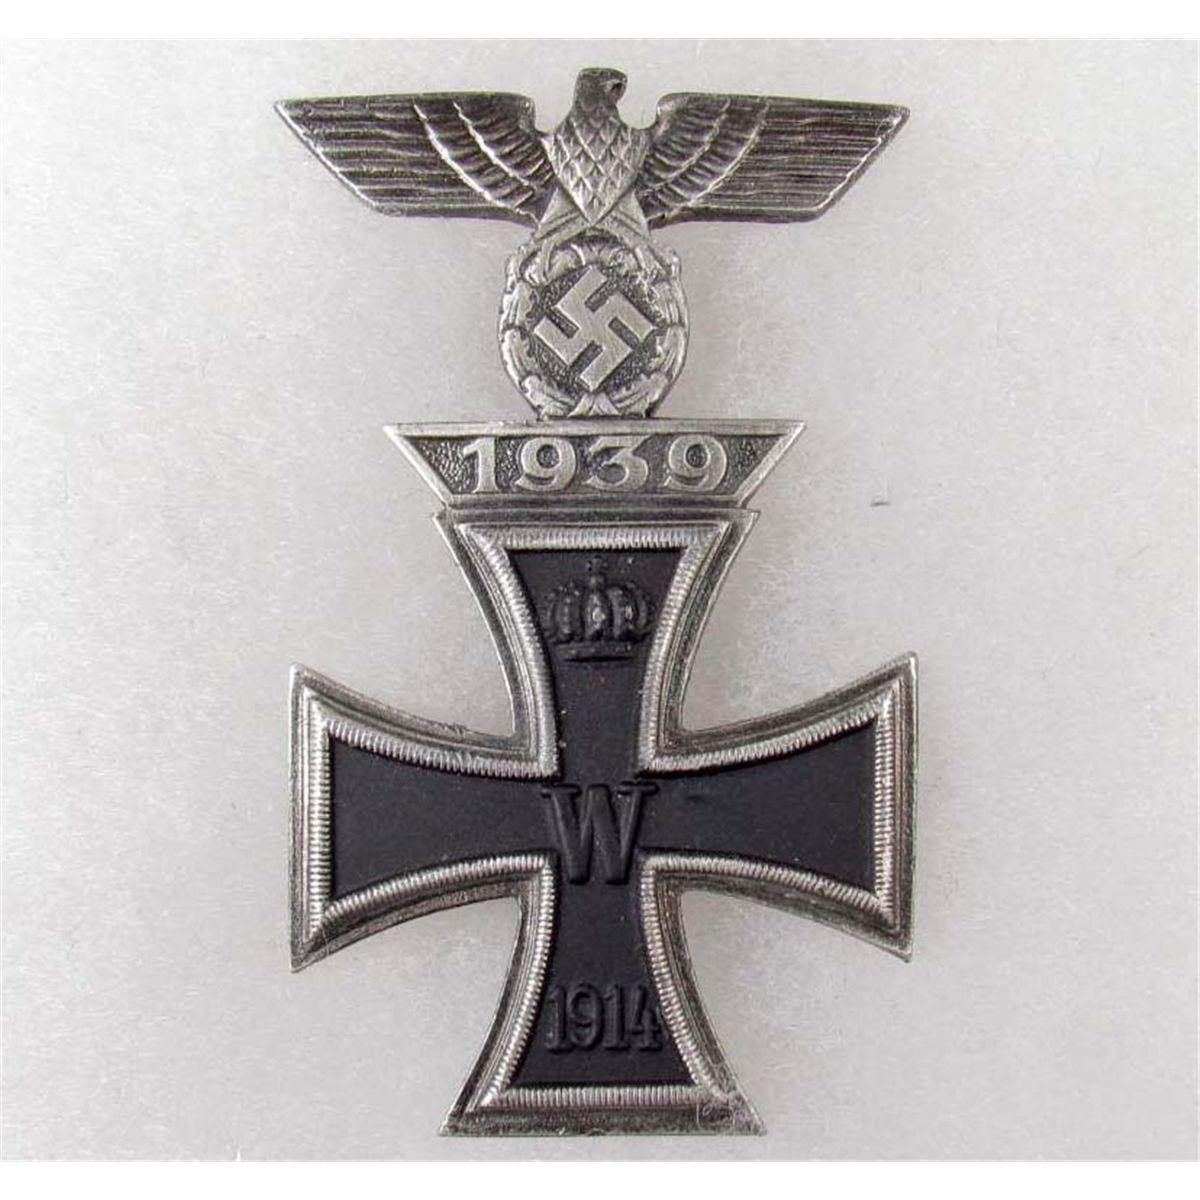 1914 IRON CROSS W/ 1939 SPANGE TO THE IRON CROSS - 1ST CLASS